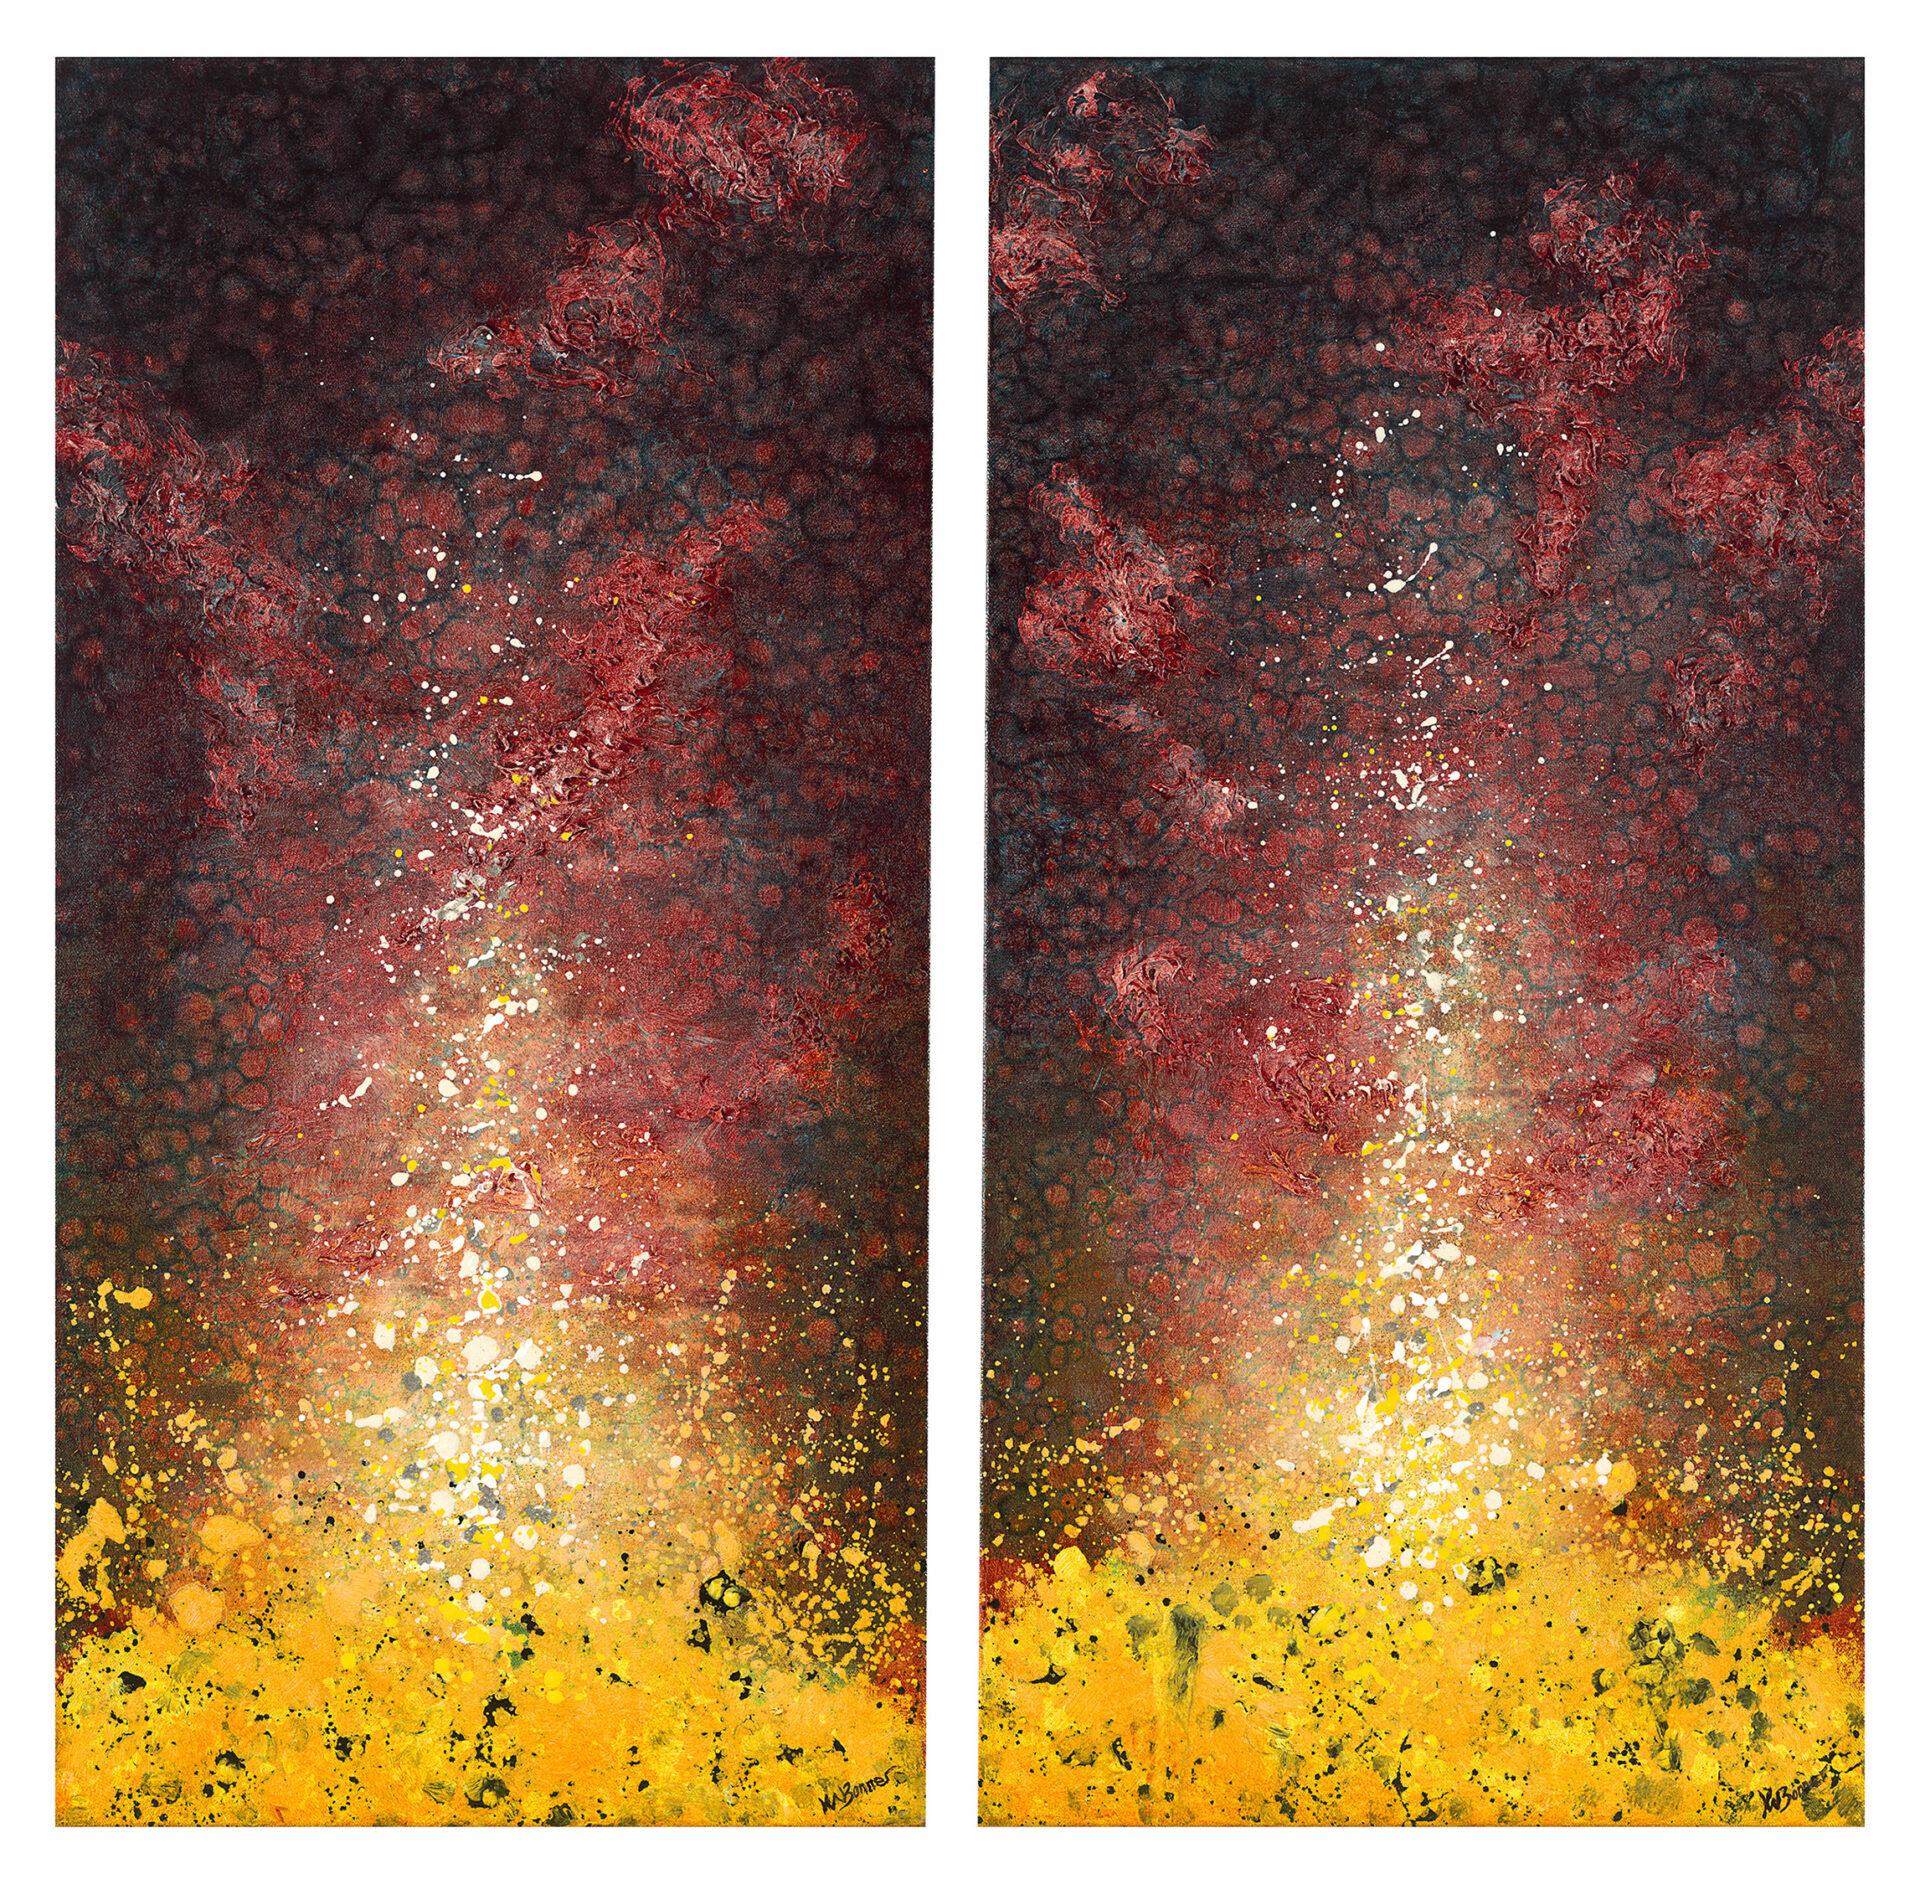 Awakening Passion | Abstract | Ken Bonner original oil painting | Santa Fe New Mexico